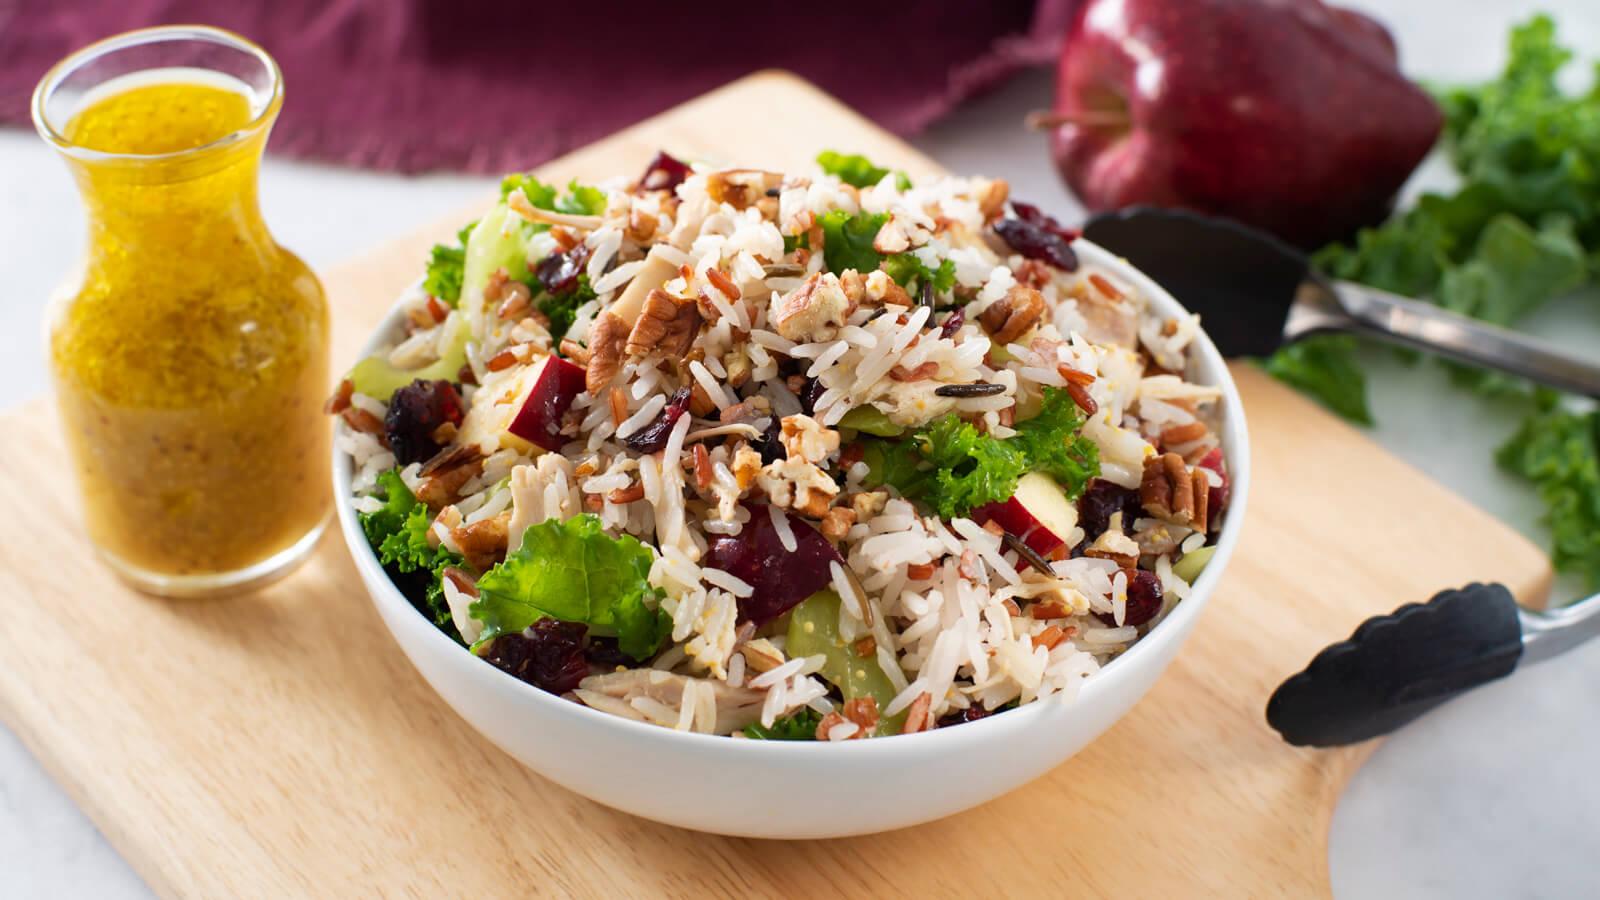 Citrus, Kale & Wild Rice Salad with Chicken